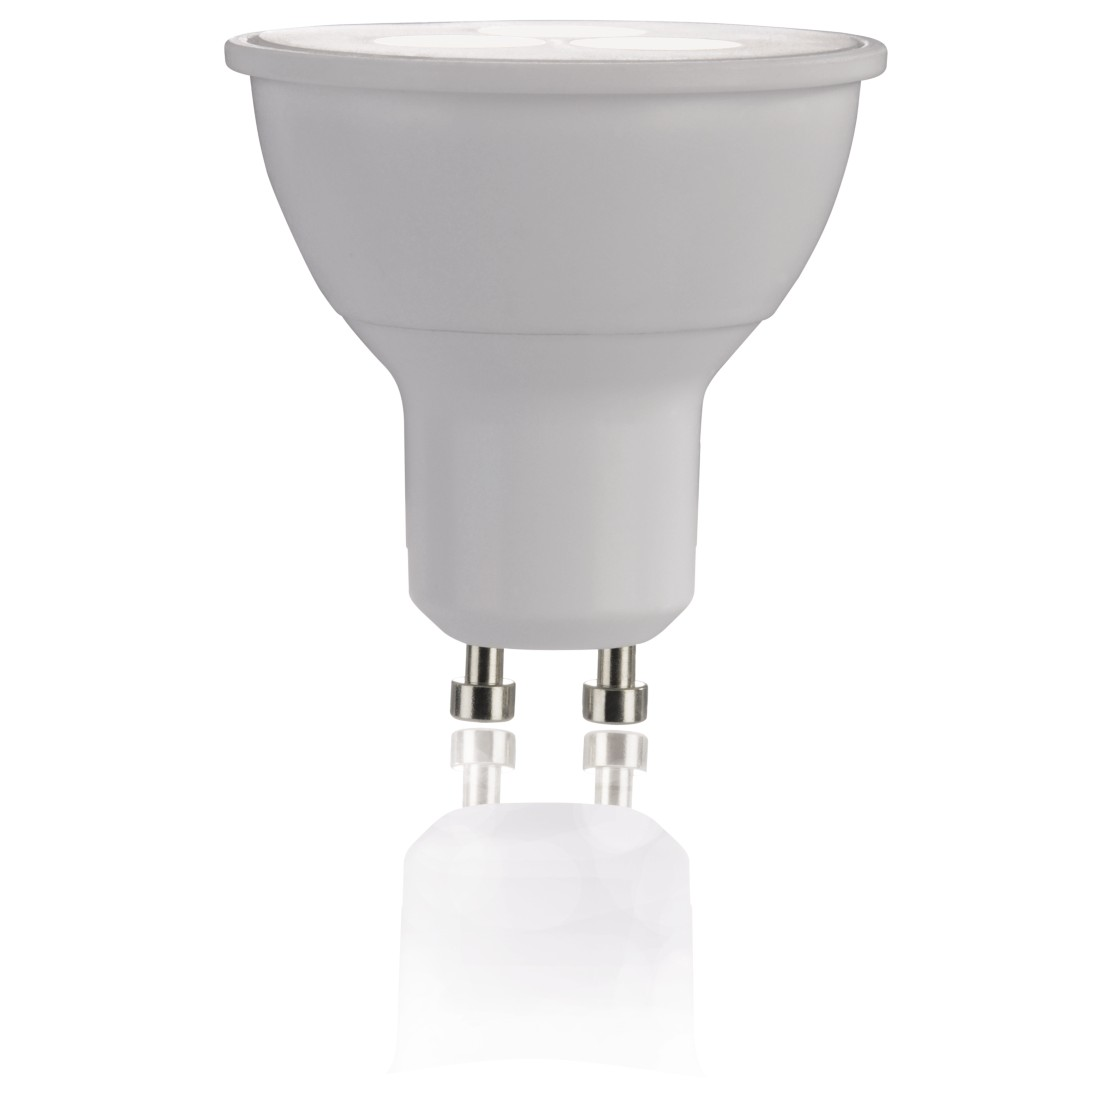 00112185 xavax led lampe gu10 250lm ersetzt 35w reflektorlampe par16 warmwei. Black Bedroom Furniture Sets. Home Design Ideas